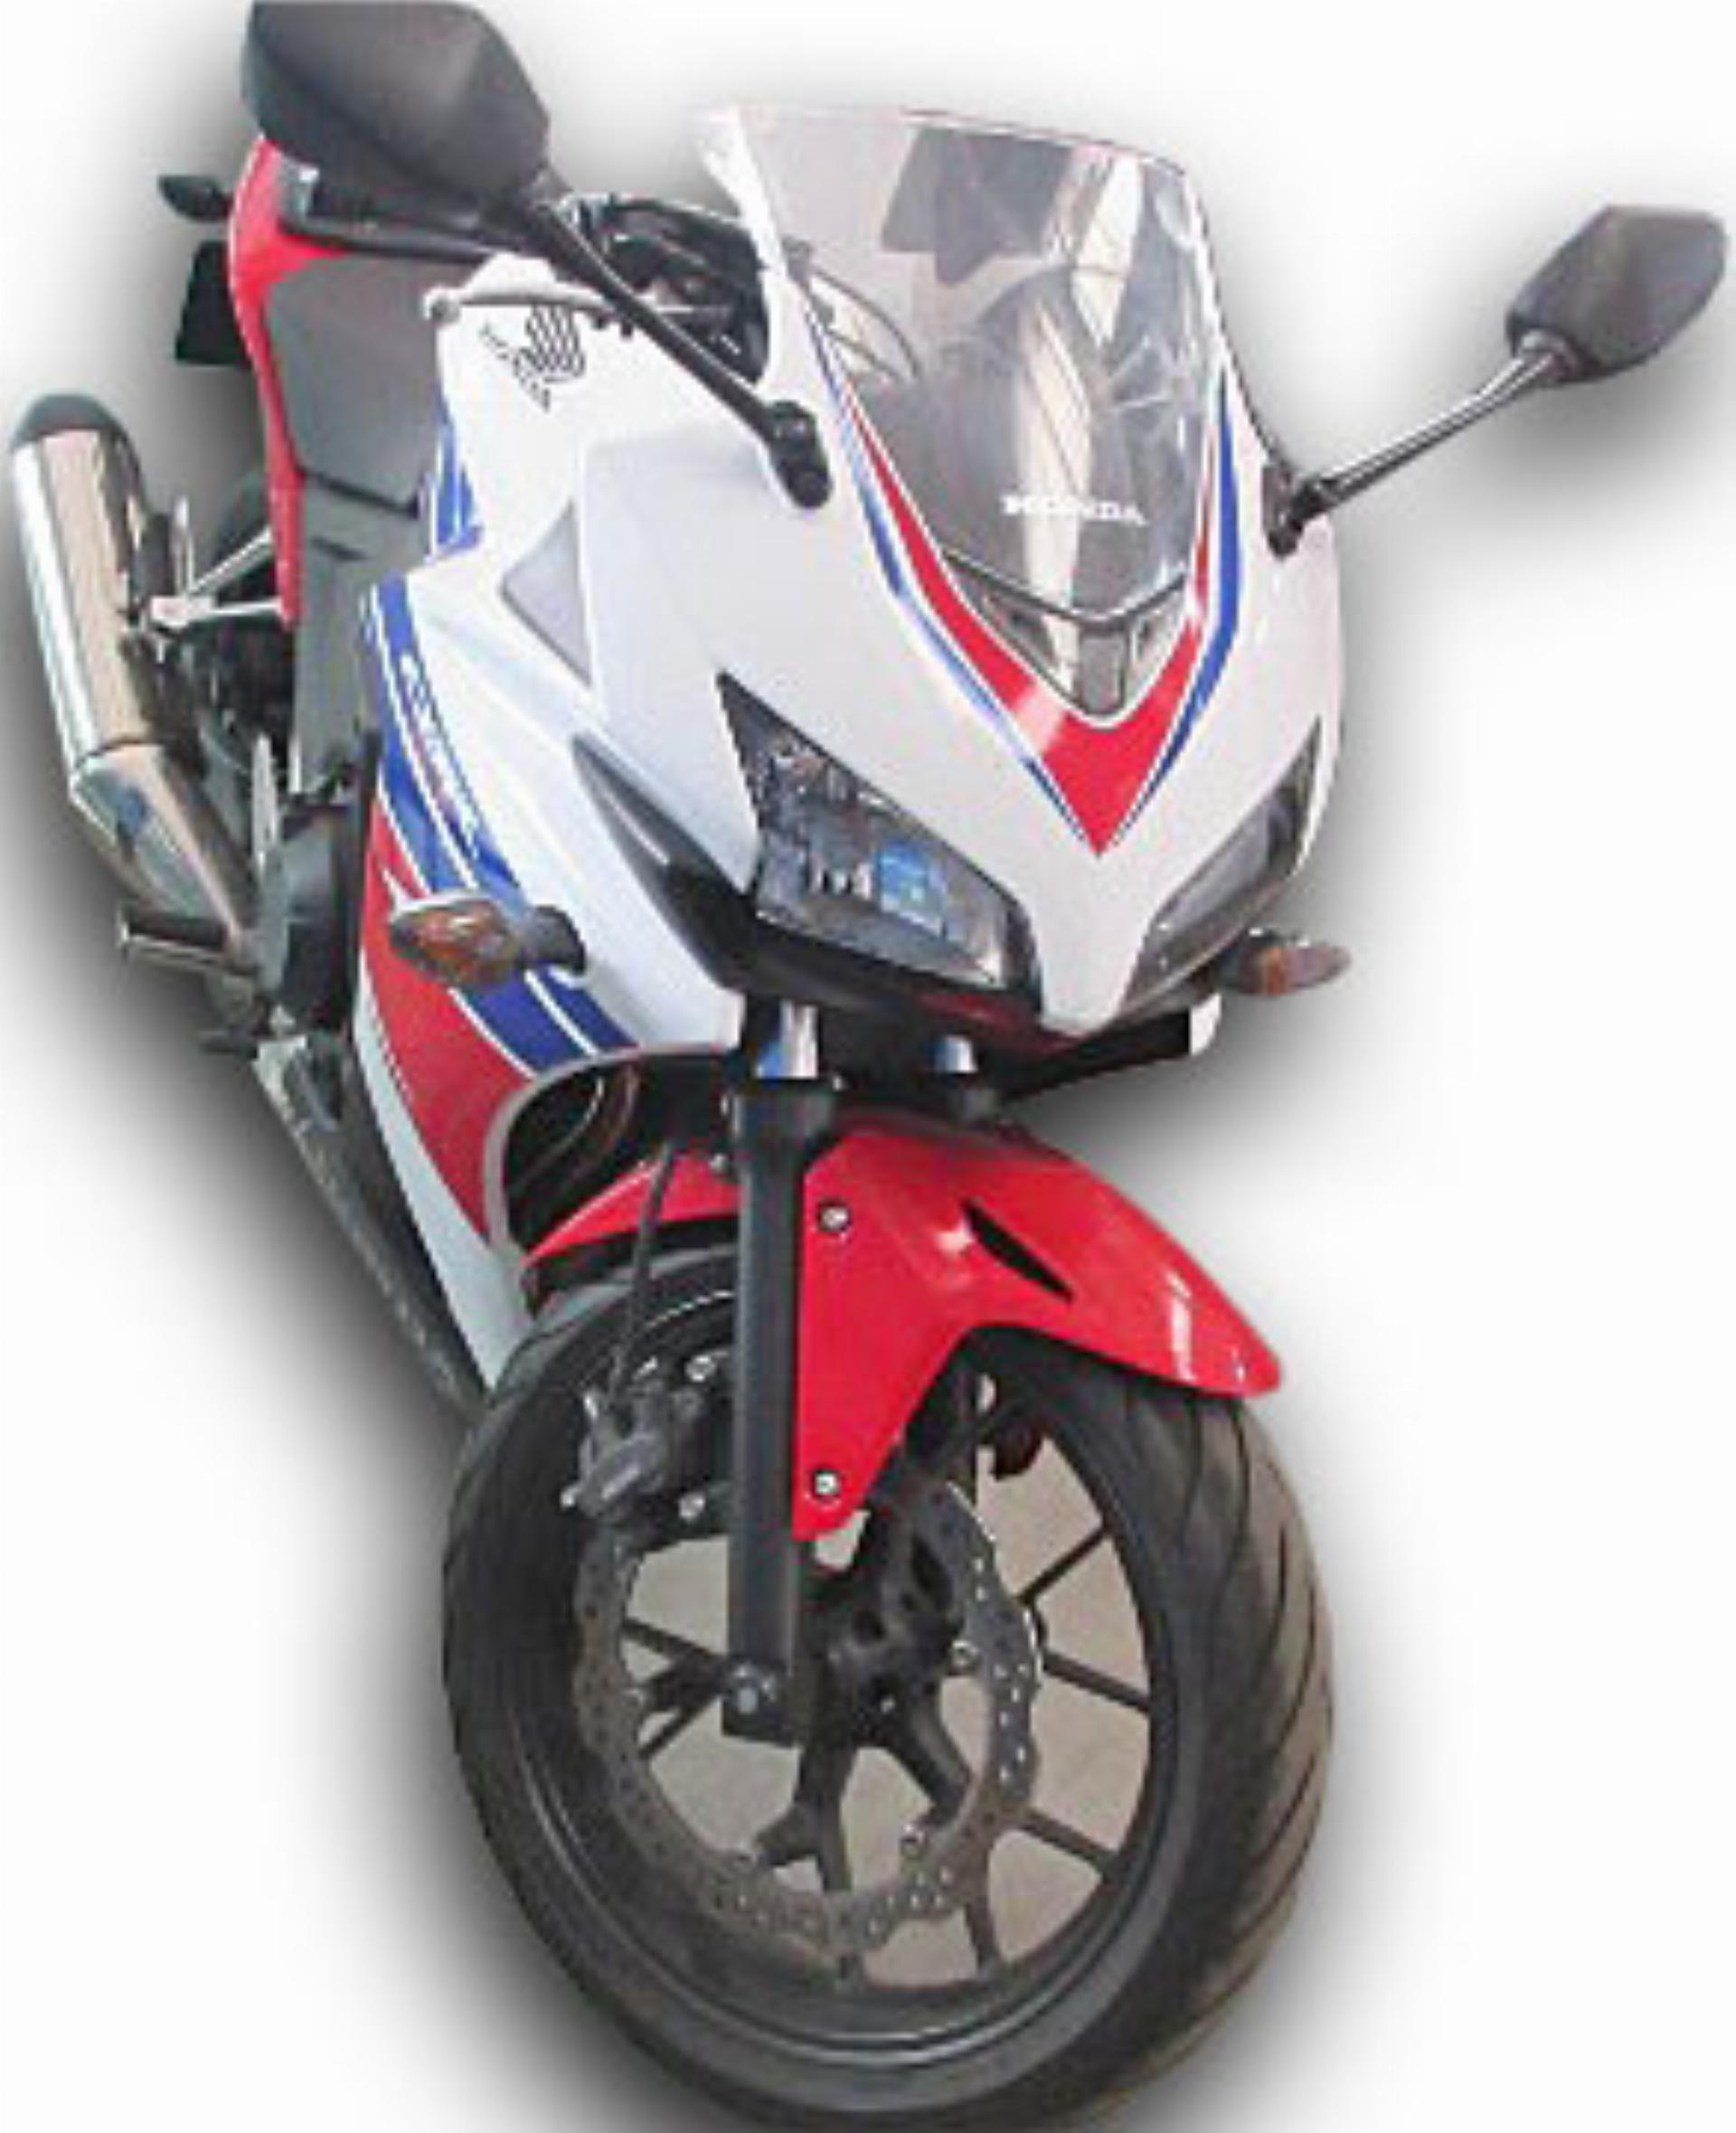 Repossessed Honda CBR 500R 2014 On Auction